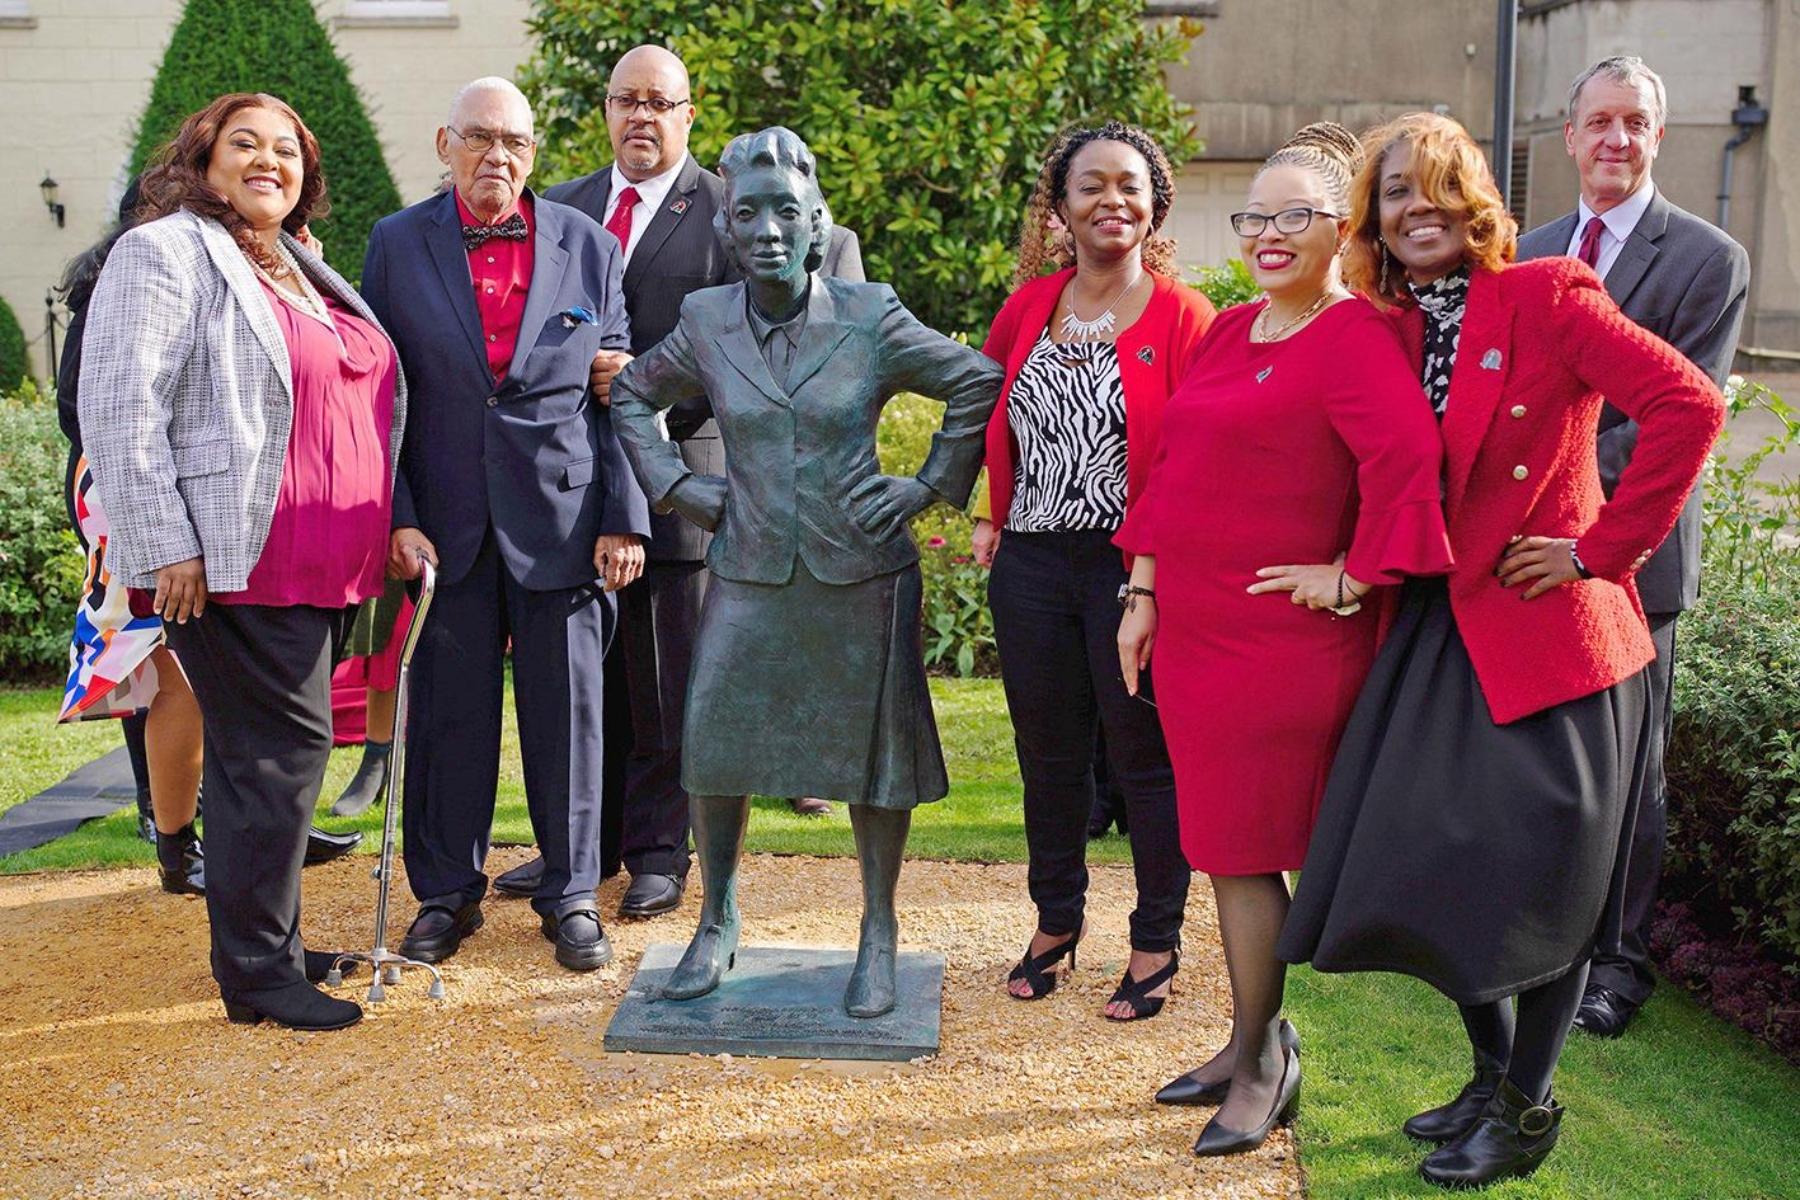 Henrietta Lacks: Ο ΠΟΥ τιμά τη γυναίκα, της οποίας τα κύτταρα άλλαξαν τον κόσμο